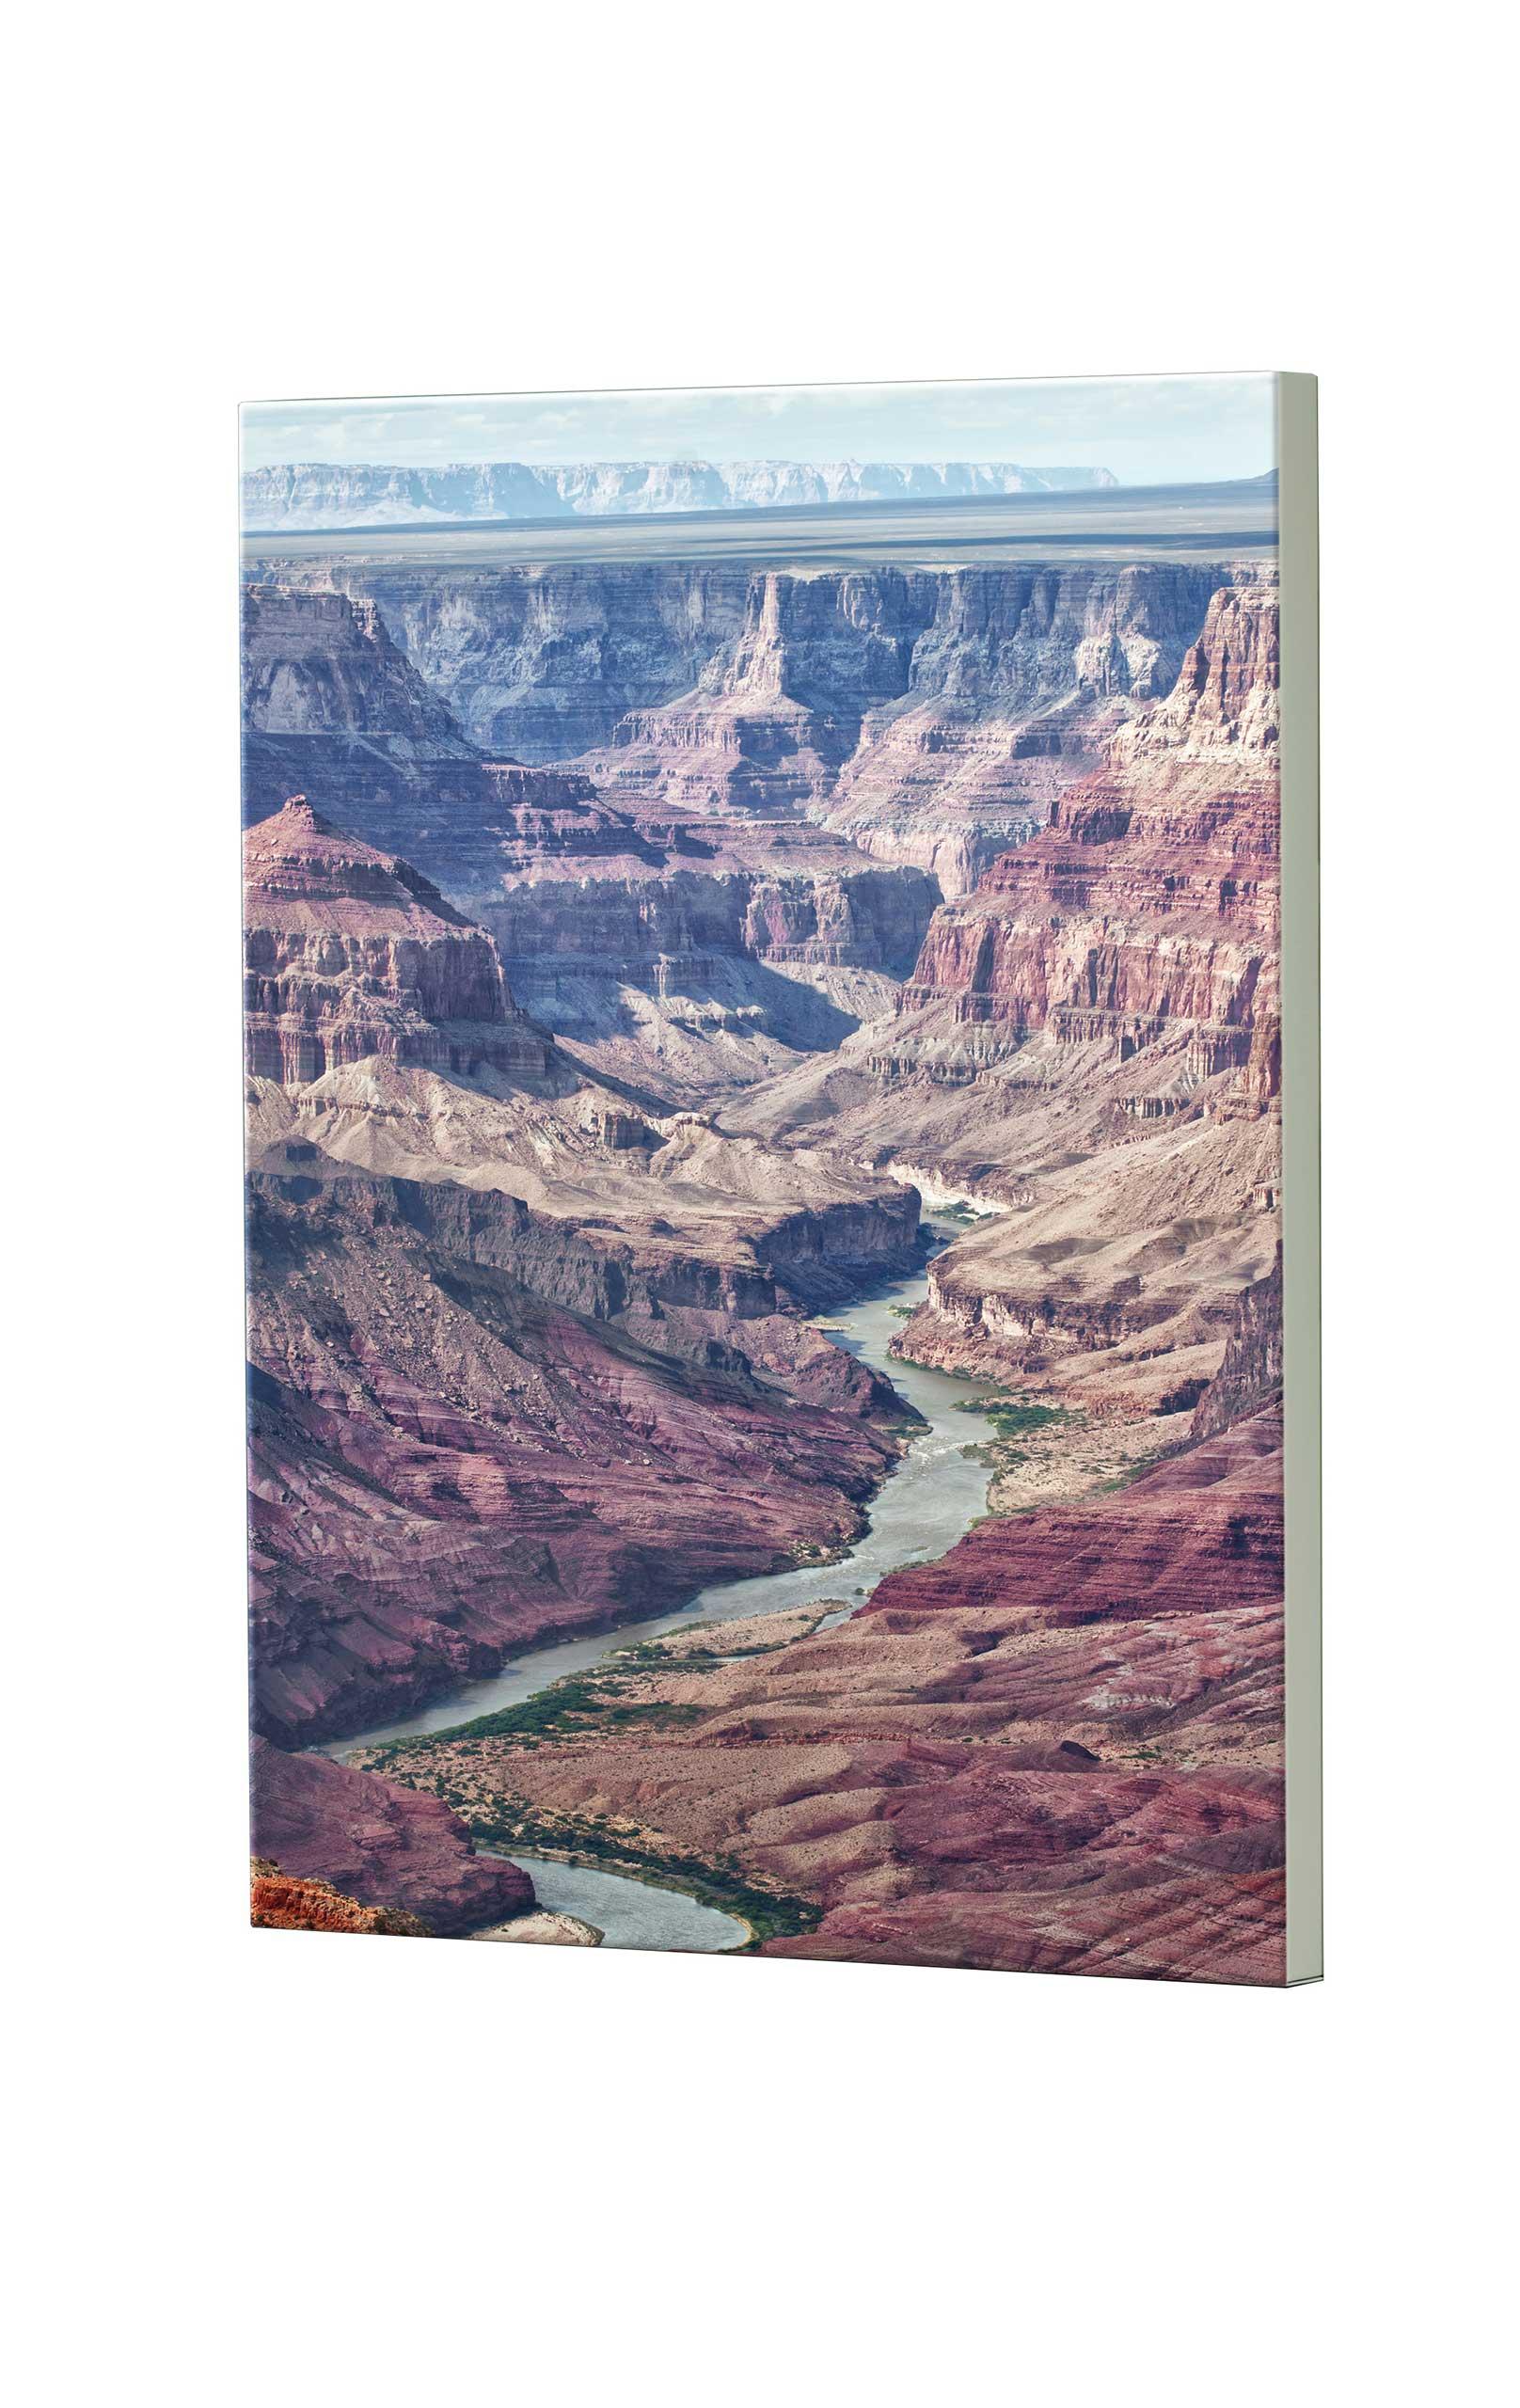 Magnettafel NOTIZ 60x80cm Motiv Grand Canyon MDH124 Motiv-Pinnwand